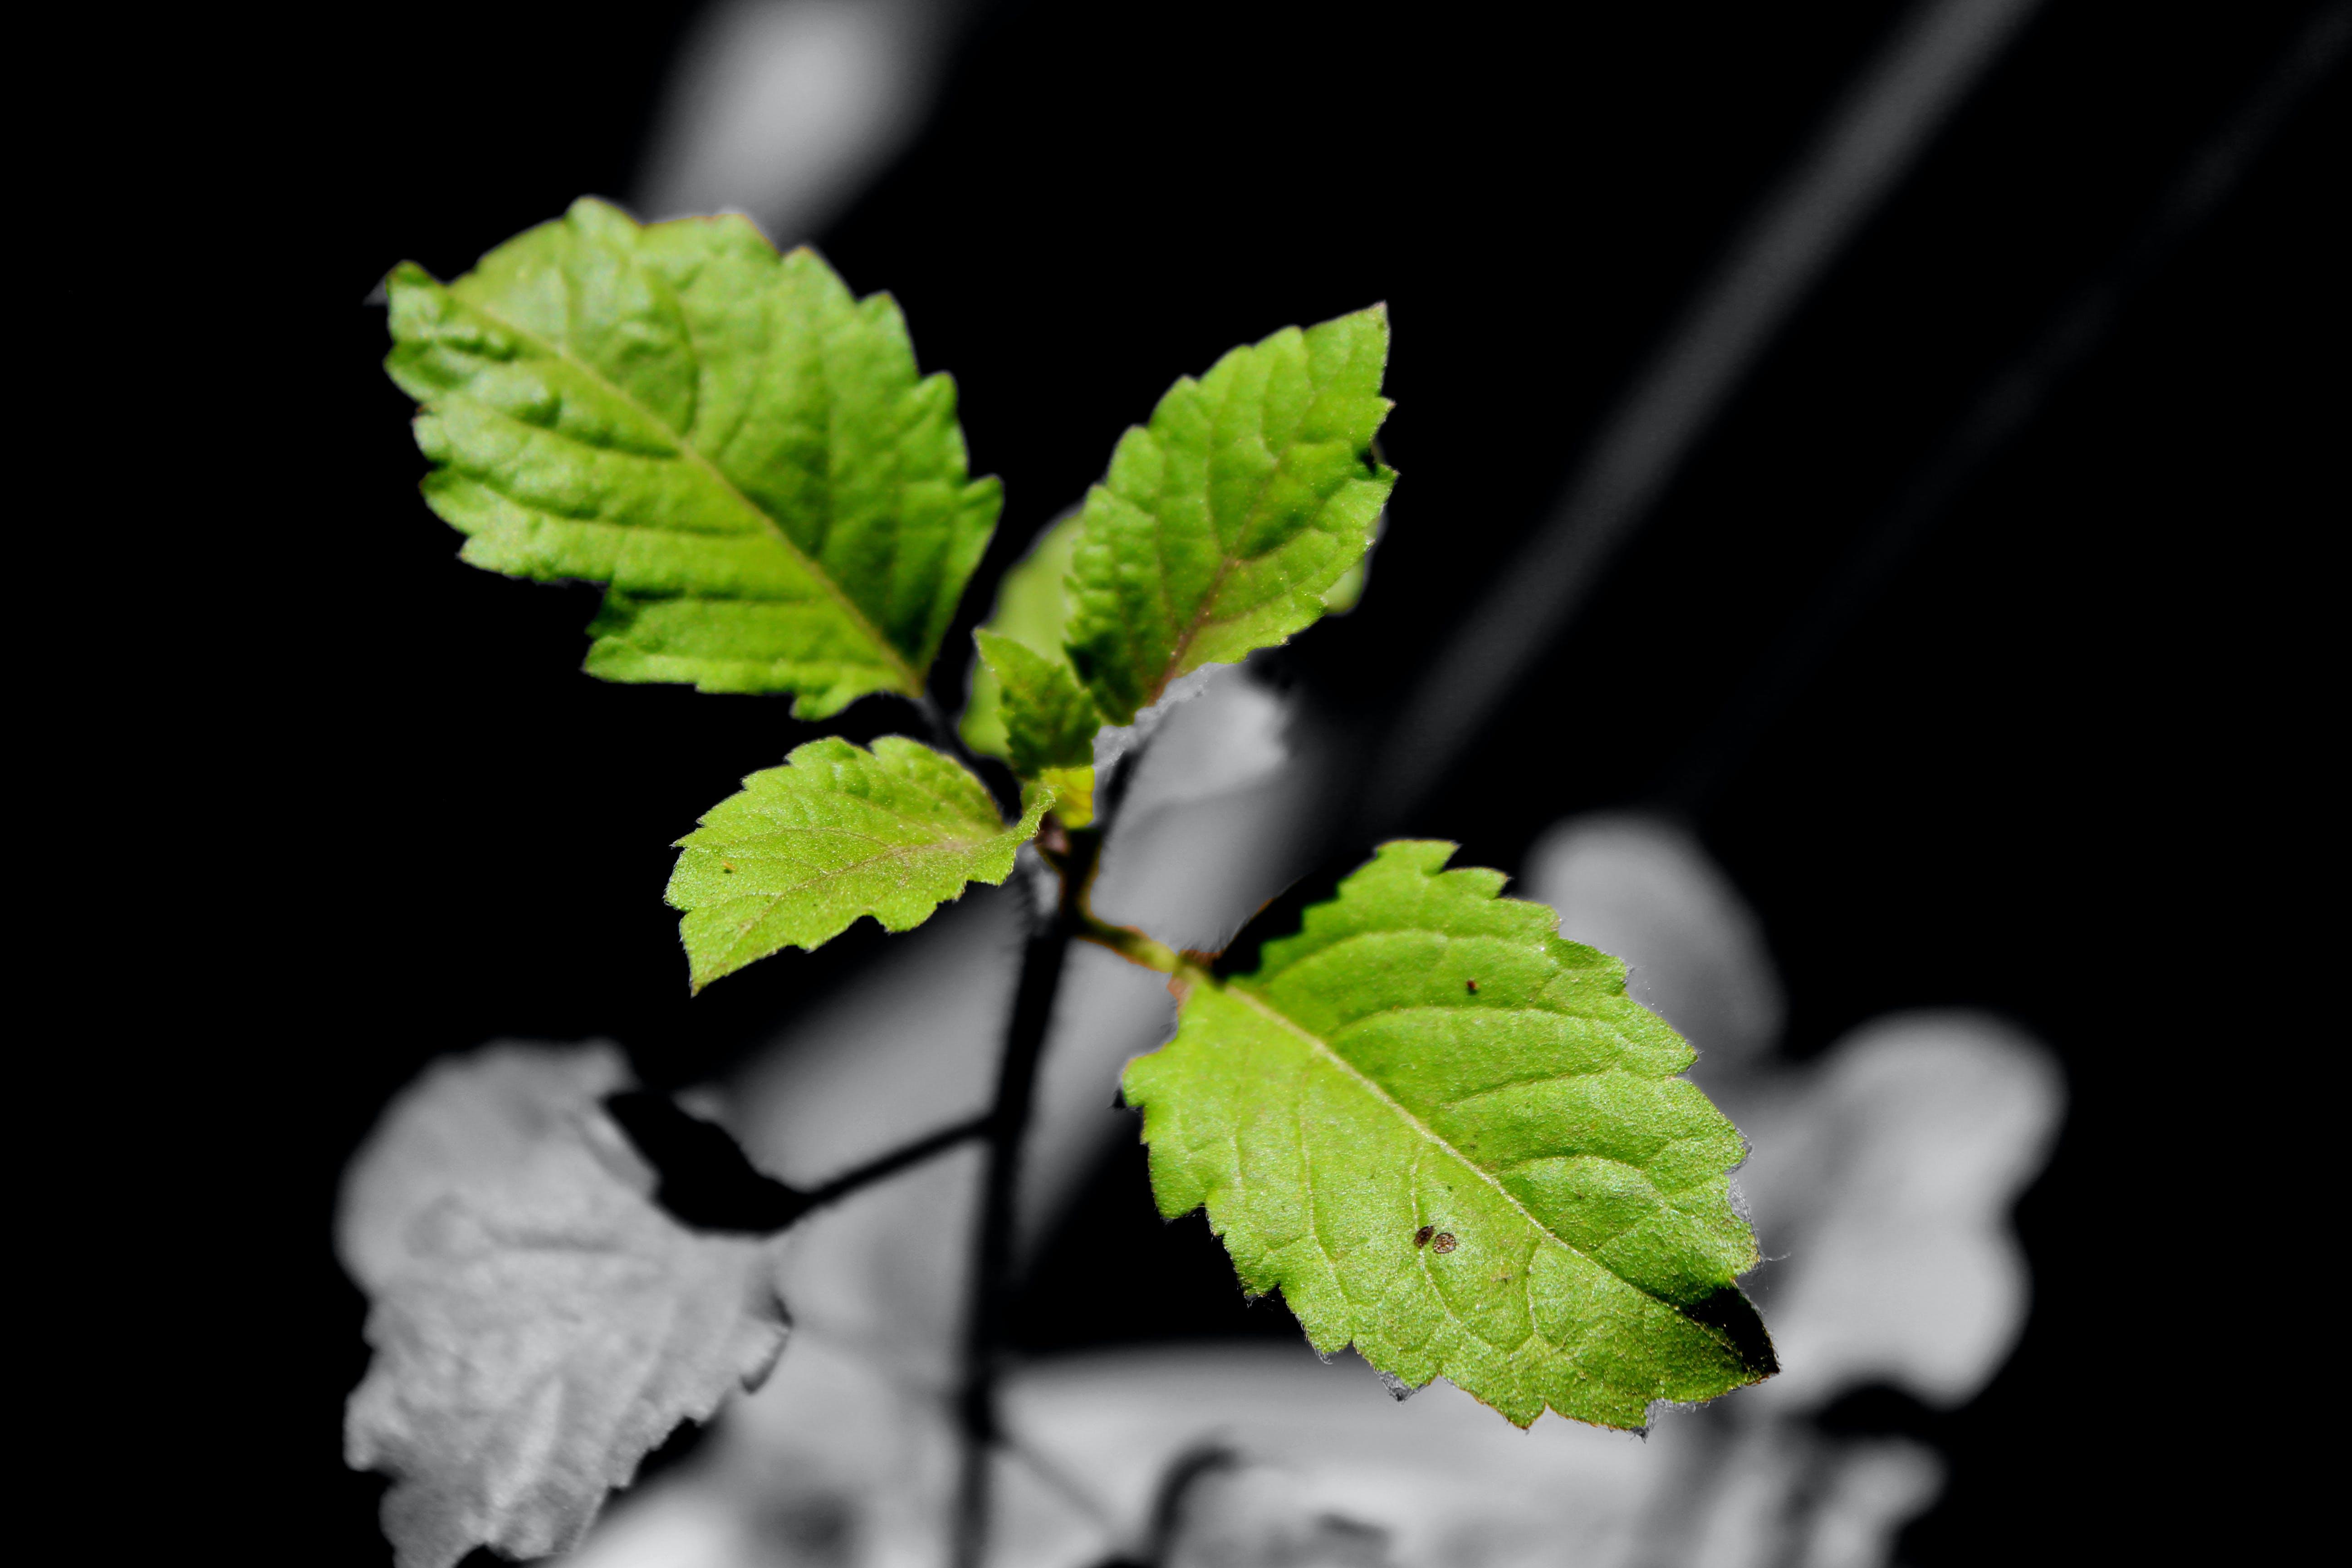 Free stock photo of #black, #blur, #foucs, #grenn